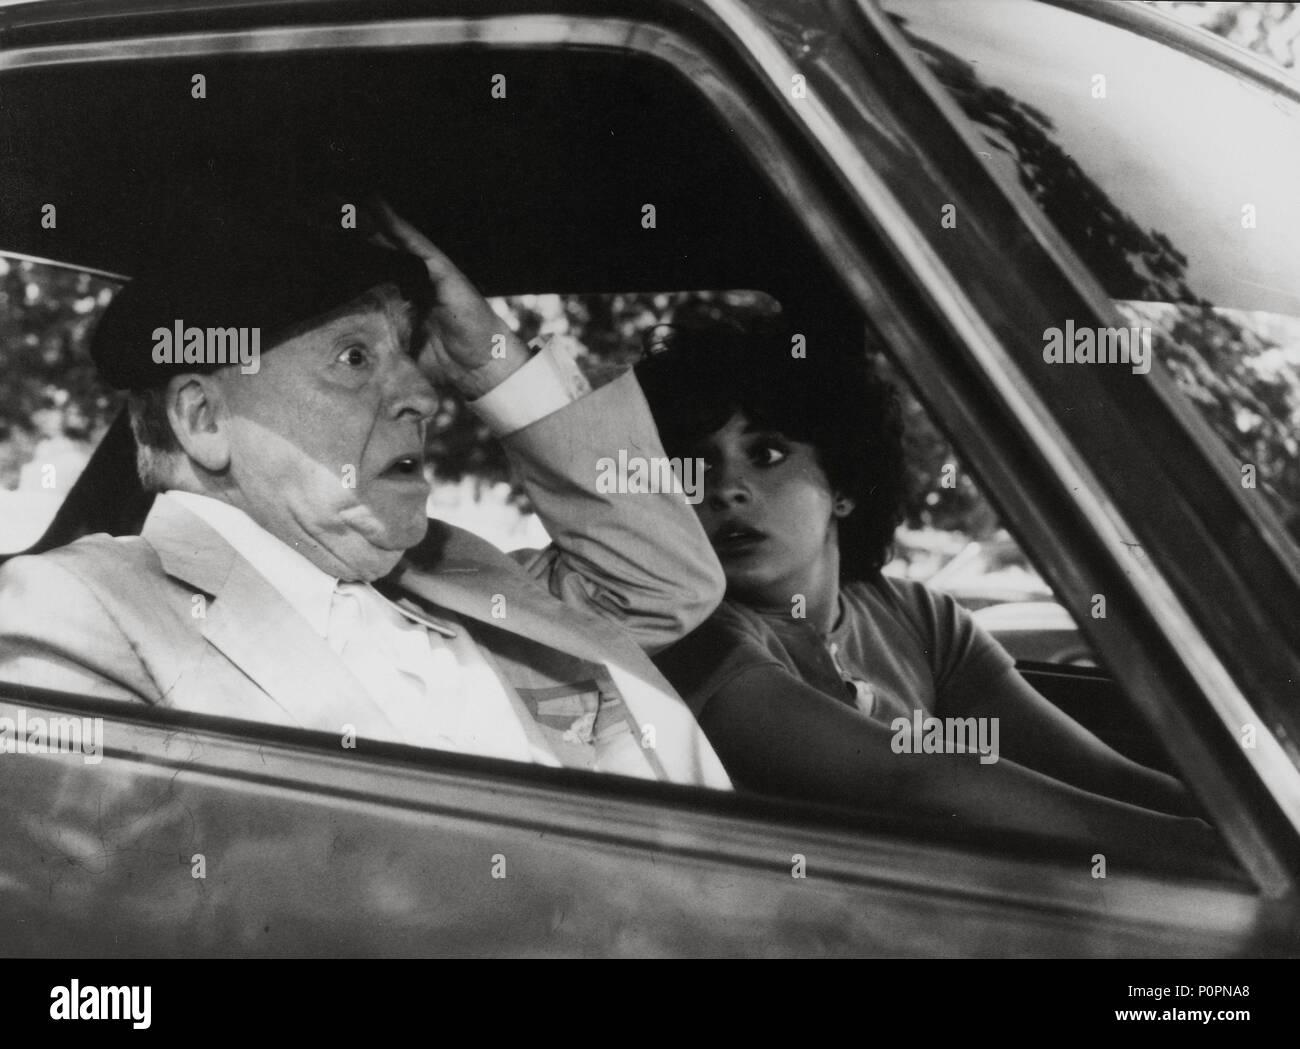 Original Film Title: ES PELIGROSO CASARSE A LOS 60.  English Title: ES PELIGROSO CASARSE A LOS 60.  Film Director: MARIANO OZORES.  Year: 1981.  Stars: PACO MARTINEZ SORIA. Credit: FILMAYER / Album Stock Photo